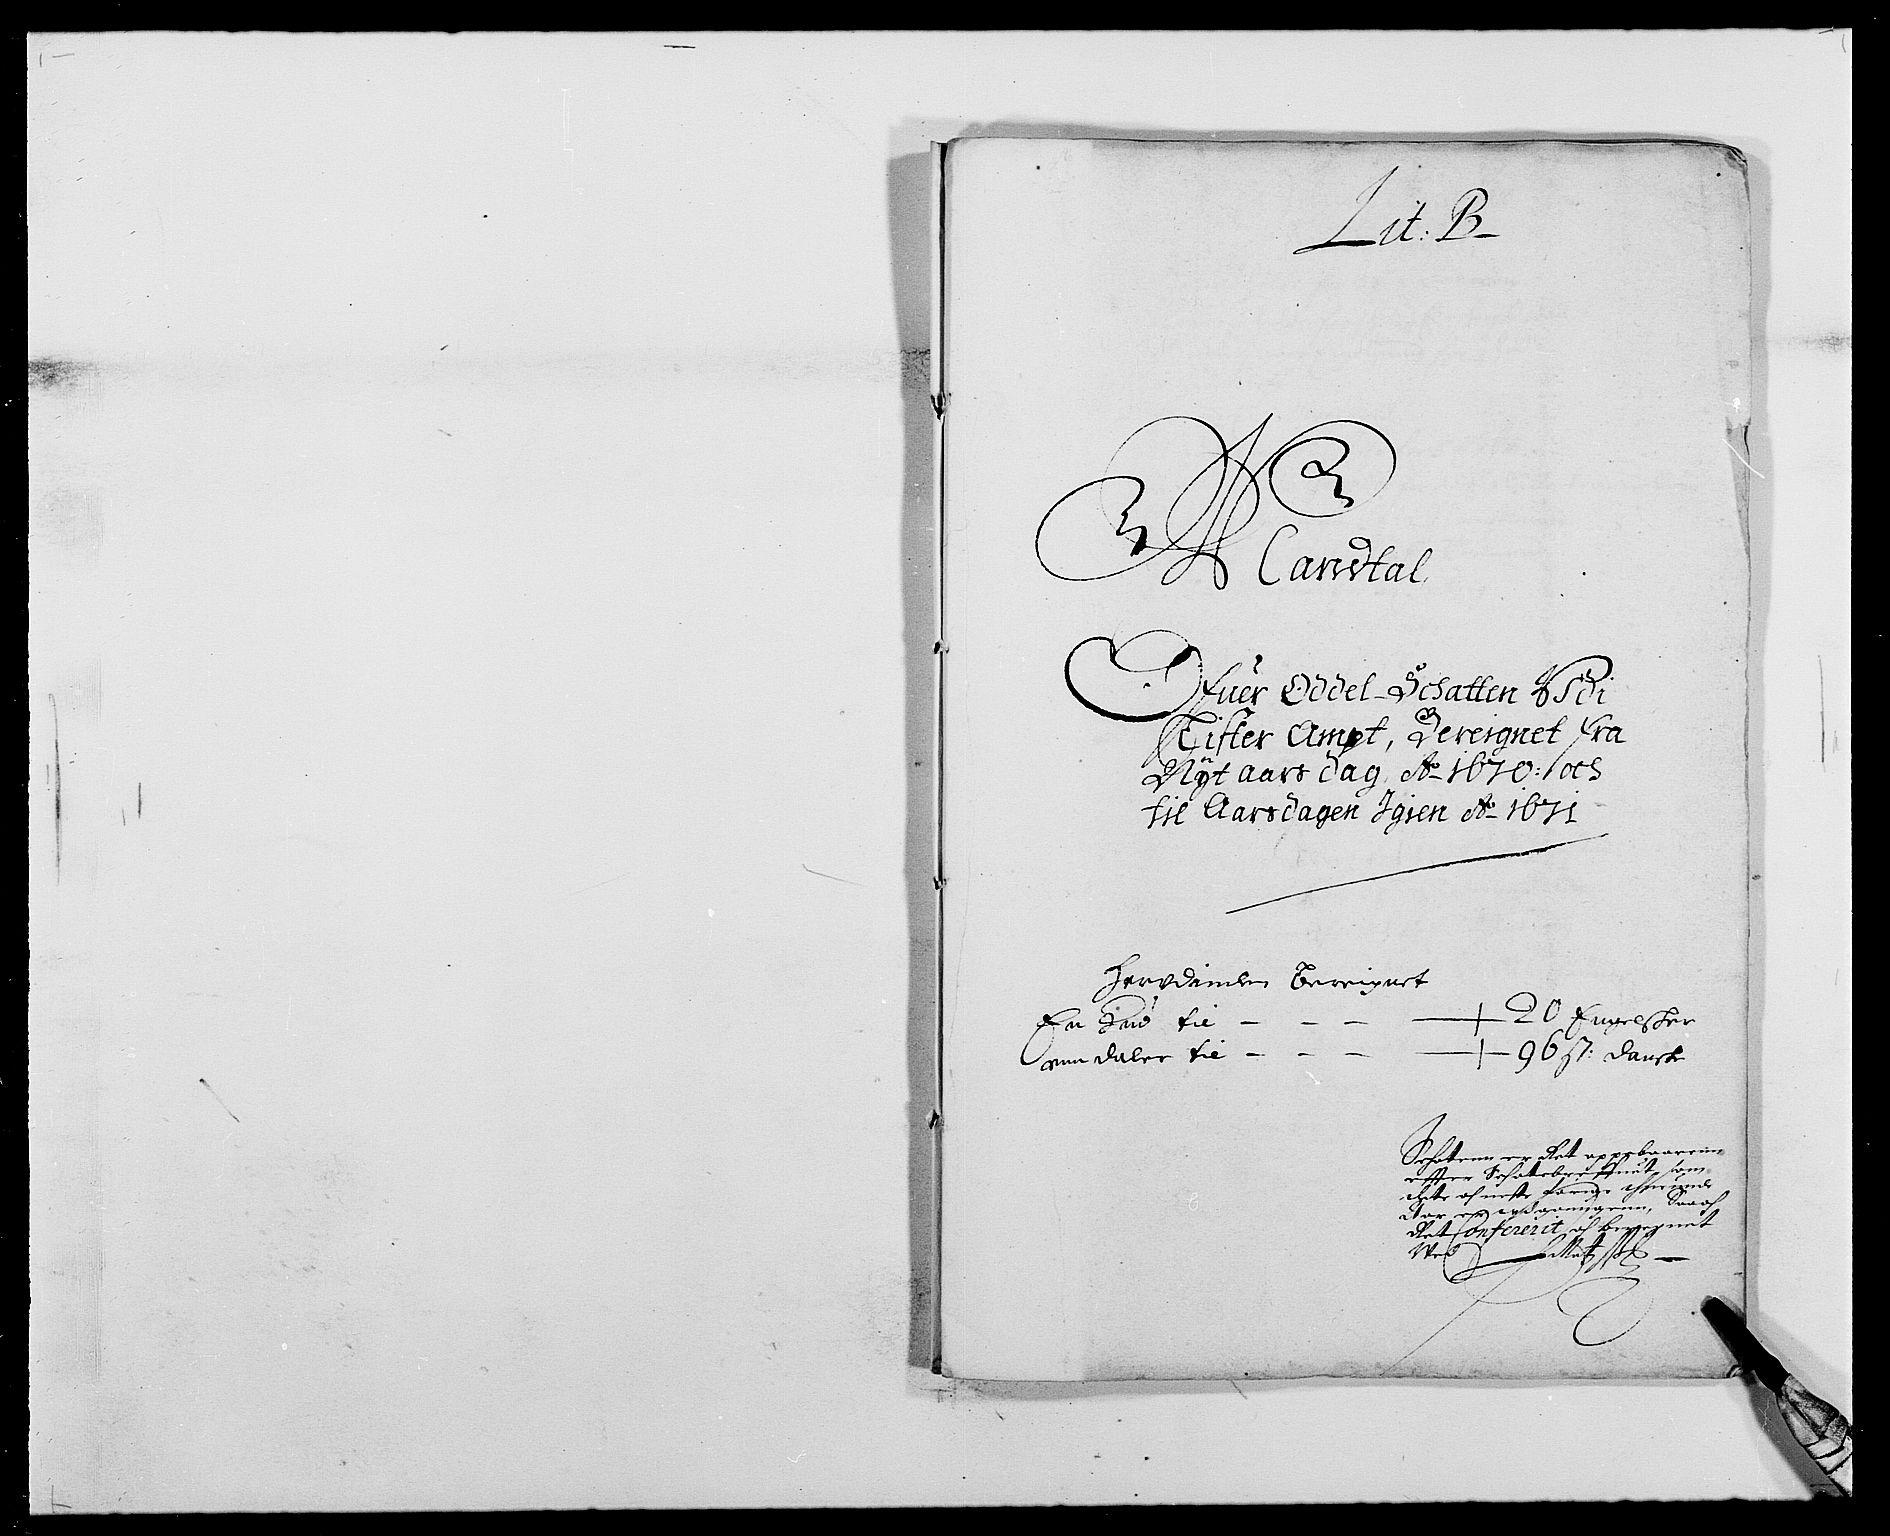 RA, Rentekammeret inntil 1814, Reviderte regnskaper, Fogderegnskap, R41/L2525: Fogderegnskap Lista, 1669-1671, s. 117